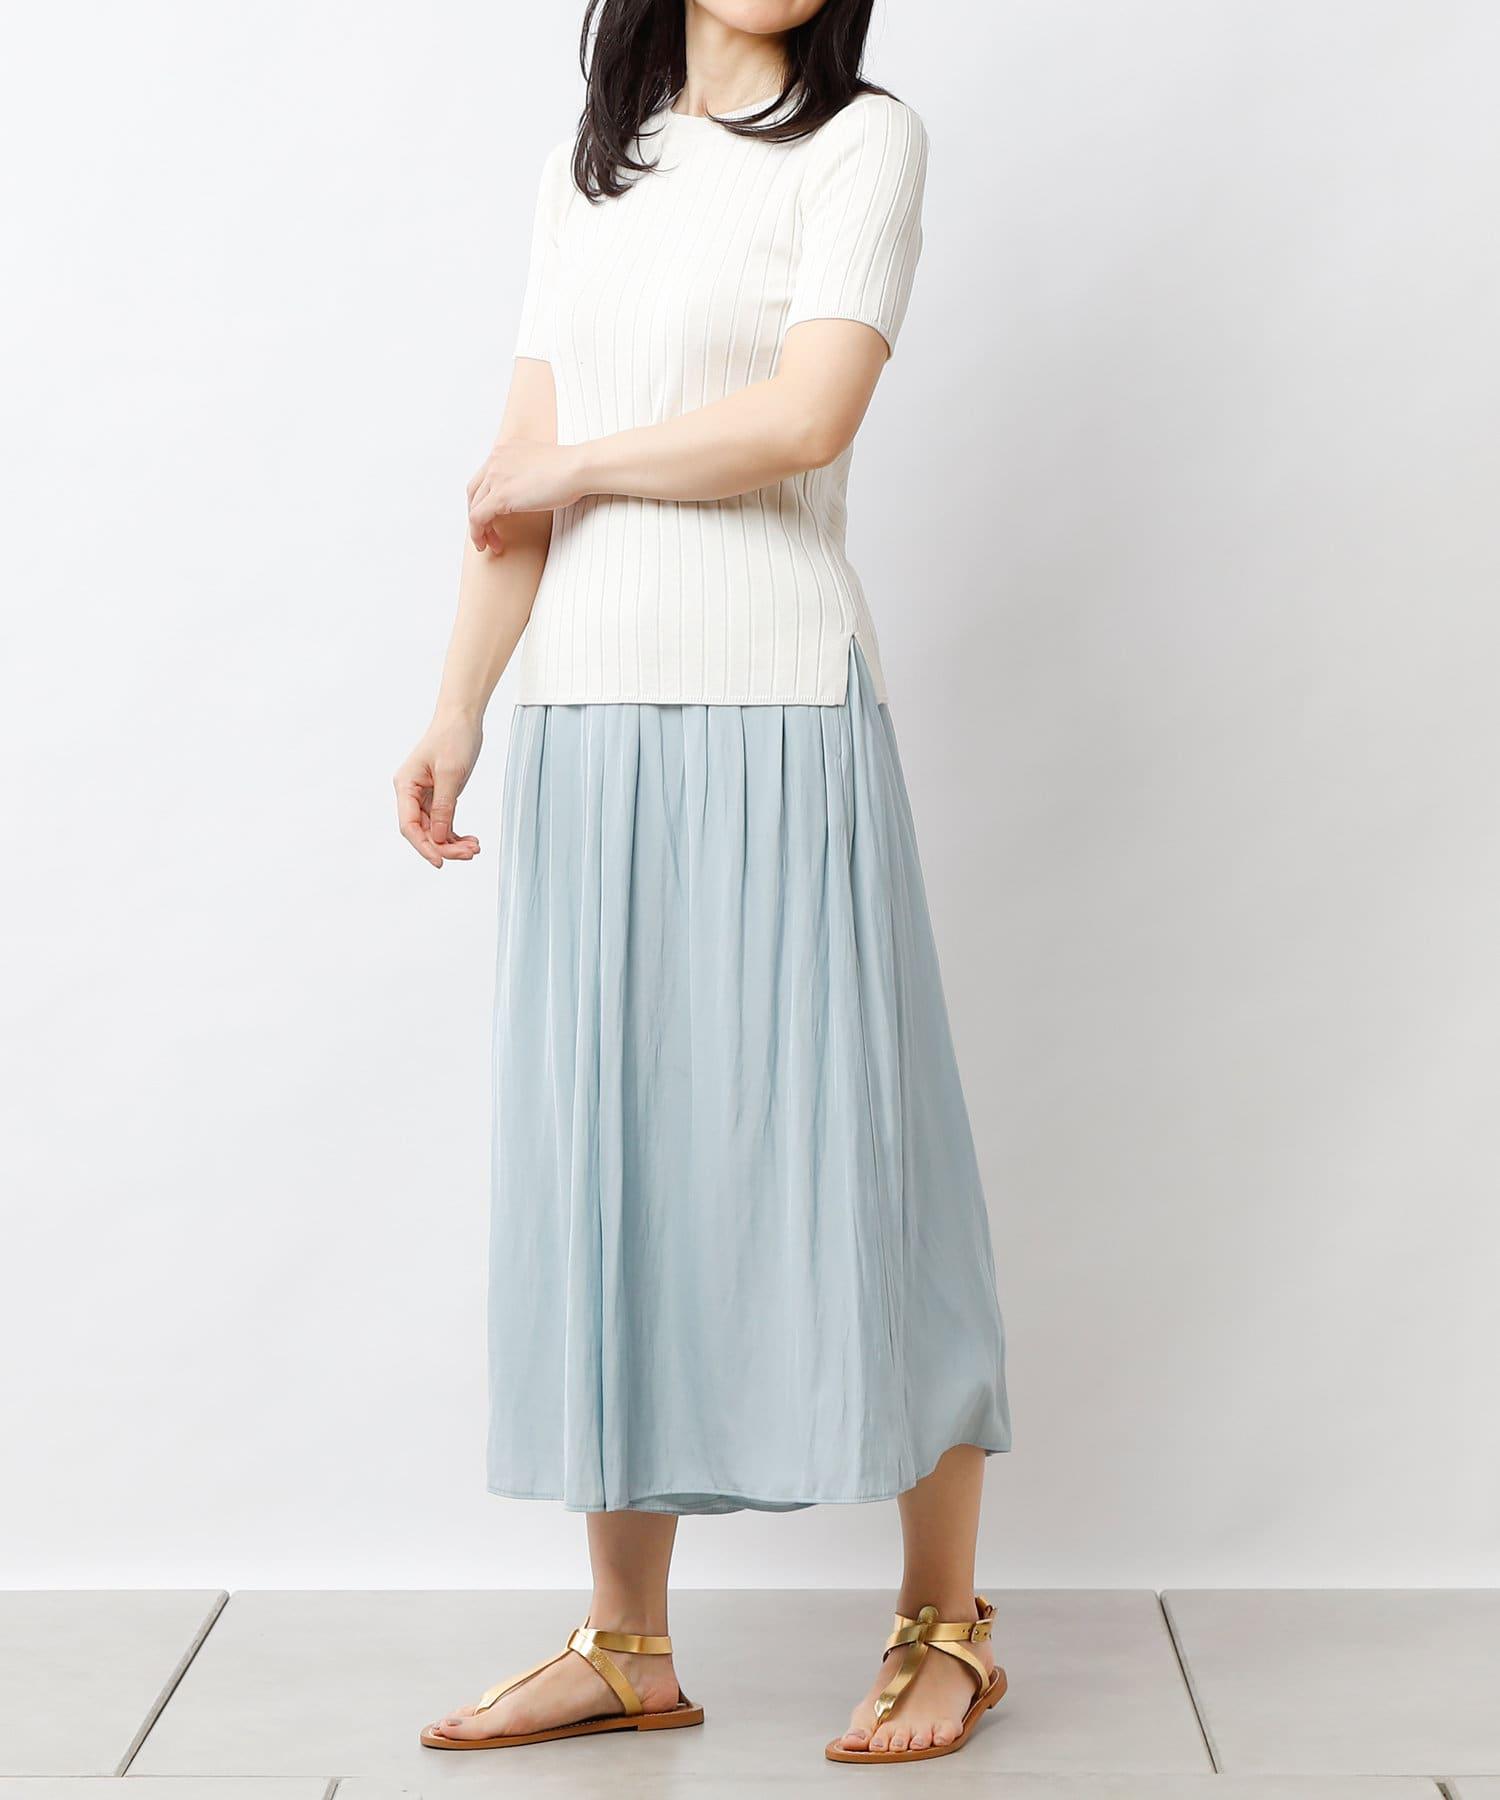 PLUS OTO.HA(プラス オトハ) エアリーナチュラルプリーツ スカーチョ